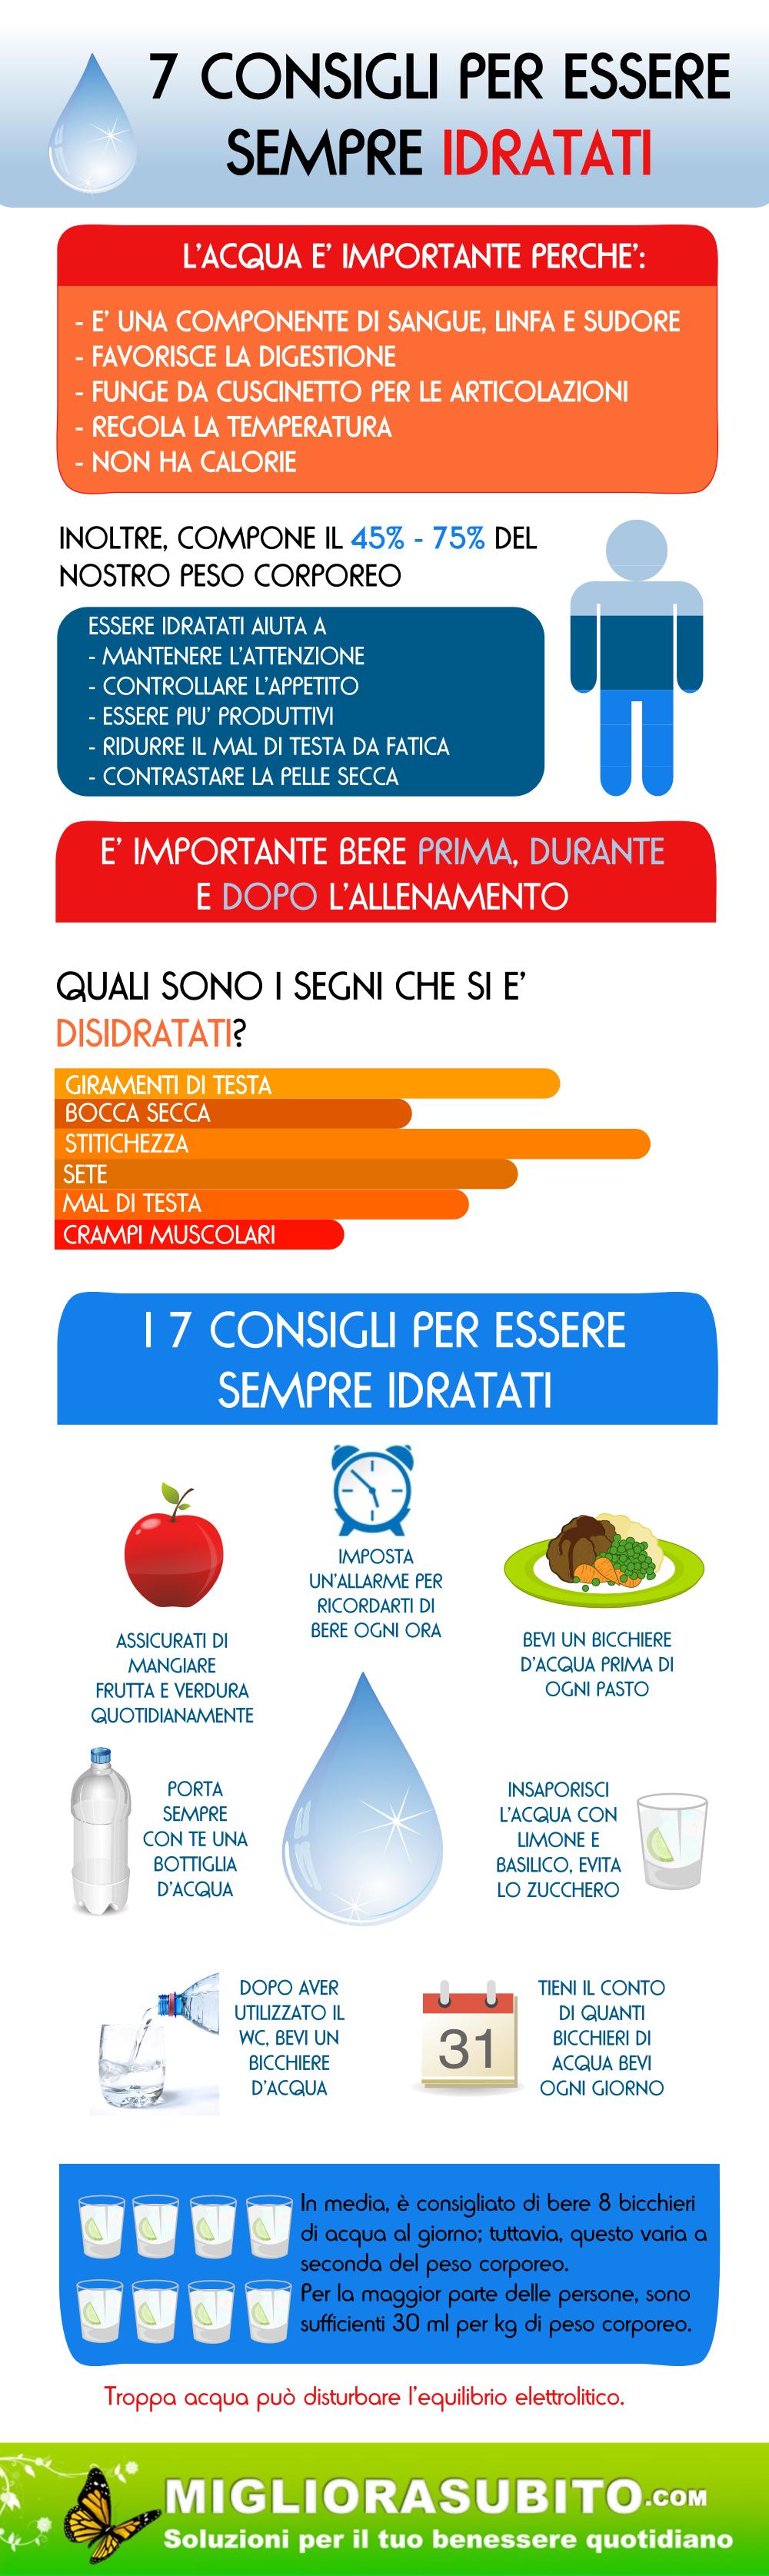 100 Infographics For World Languages Italian Ideas World Languages Learning Italian Infographic